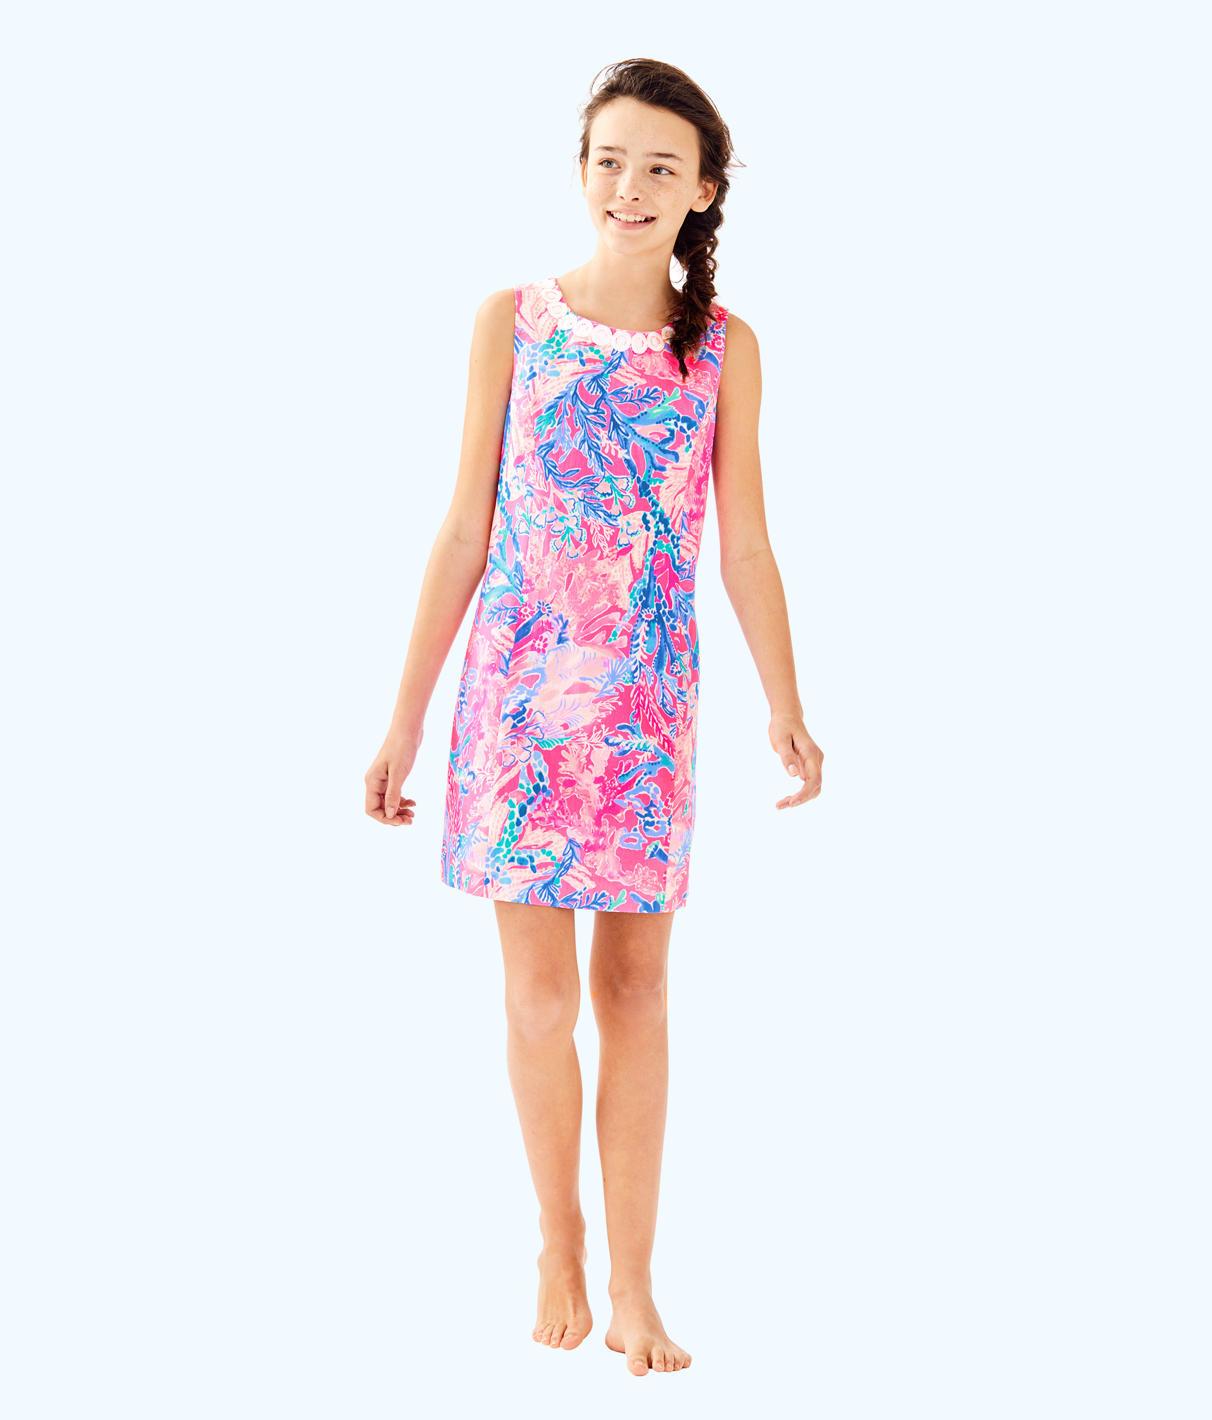 Lilly Pulitzer Lilly Pulitzer Girls Mini Mila Shift Dress